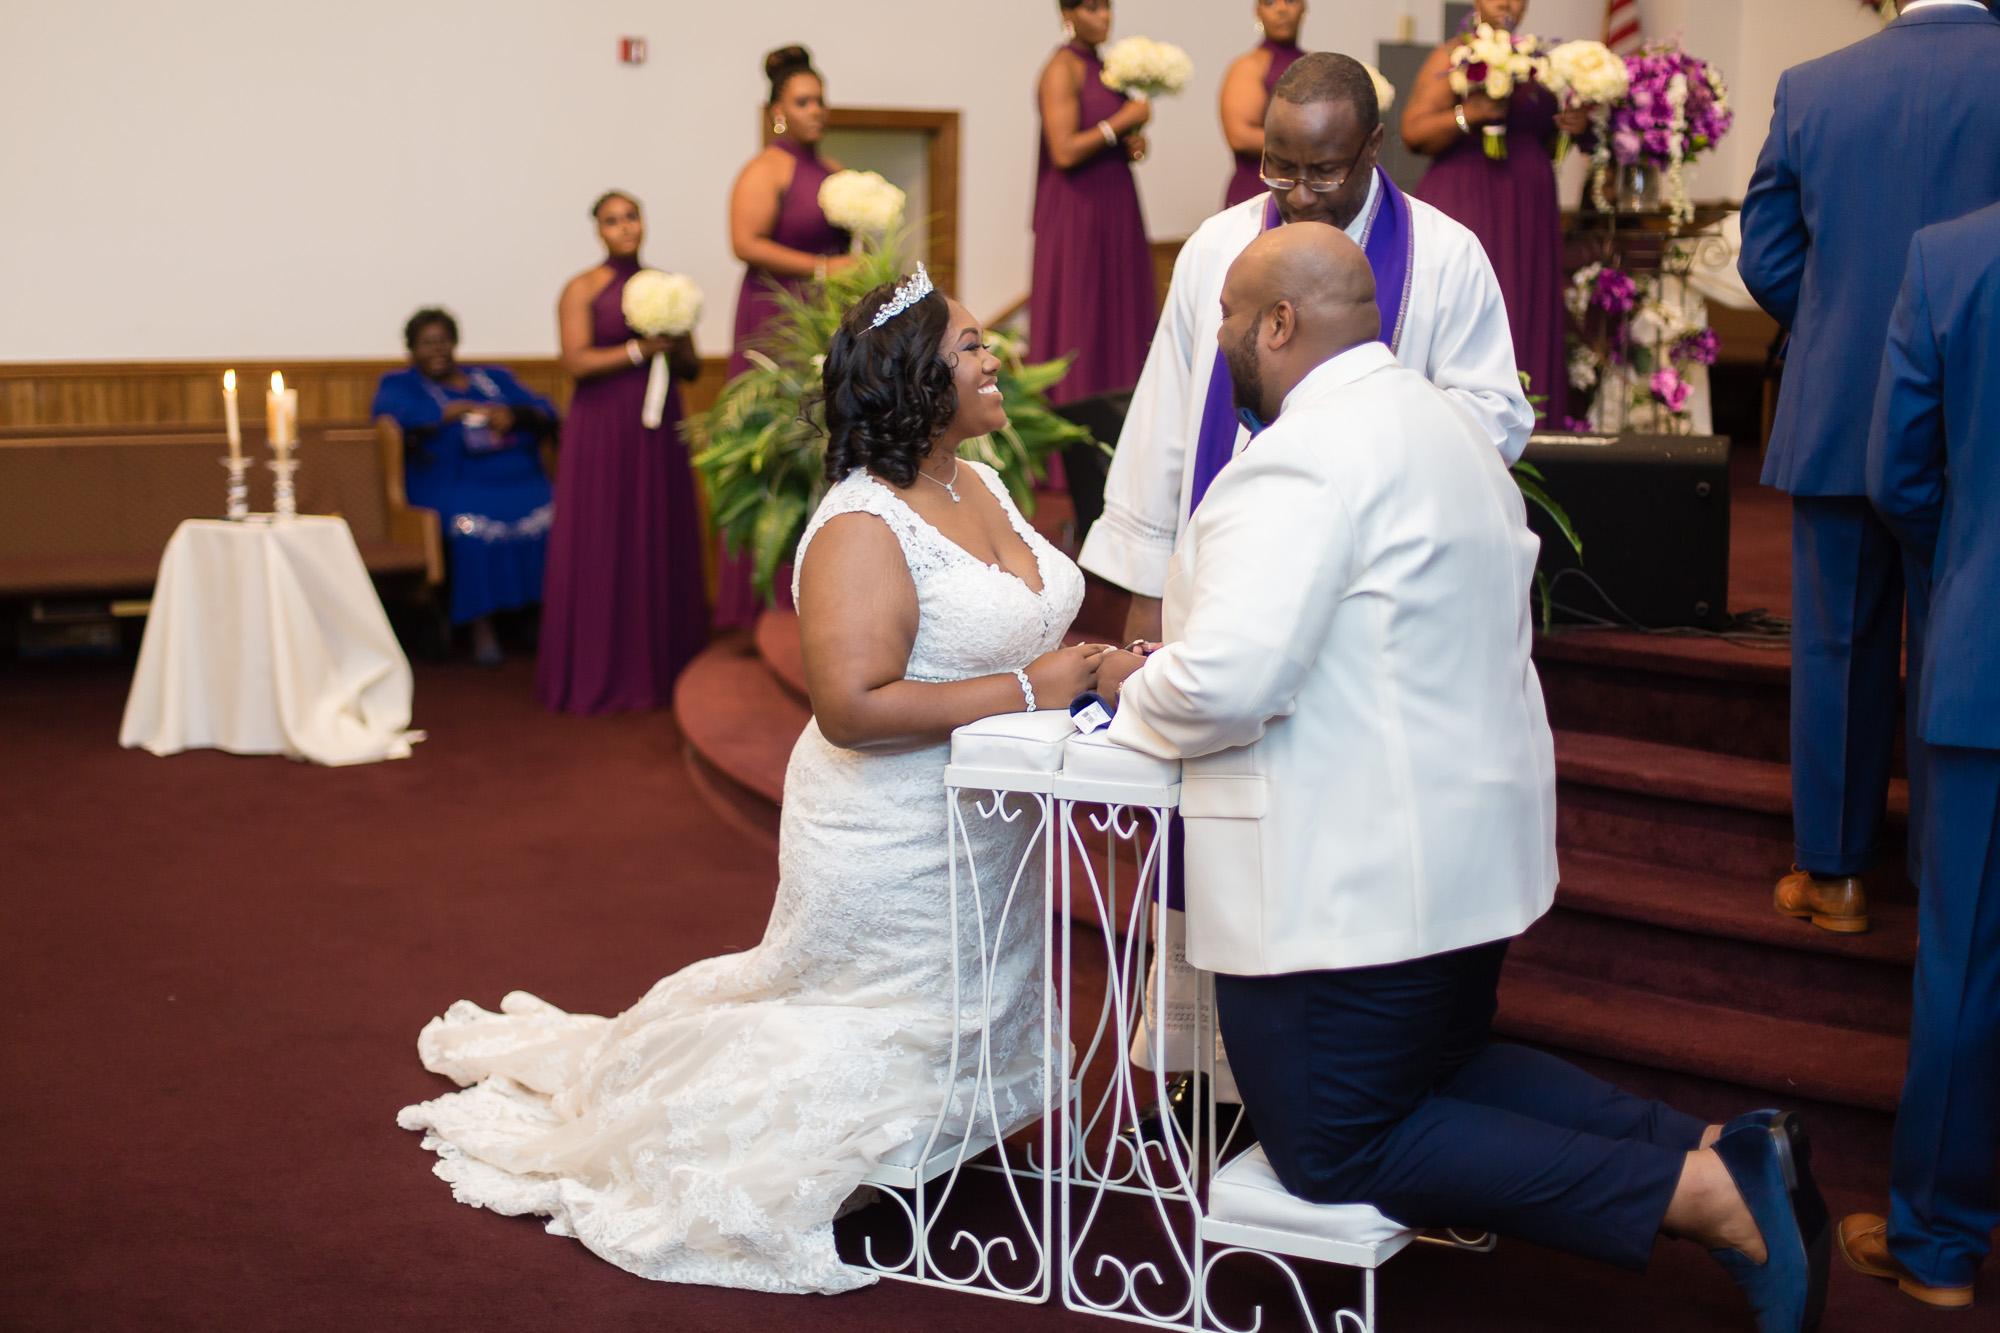 Kristin + Will   Communion   Mount Calvary Christian Center Wedding Ceremony  Greenville NC Wedding Photographer   Bryant Tyson Photography   www.memoriesbybryant.com